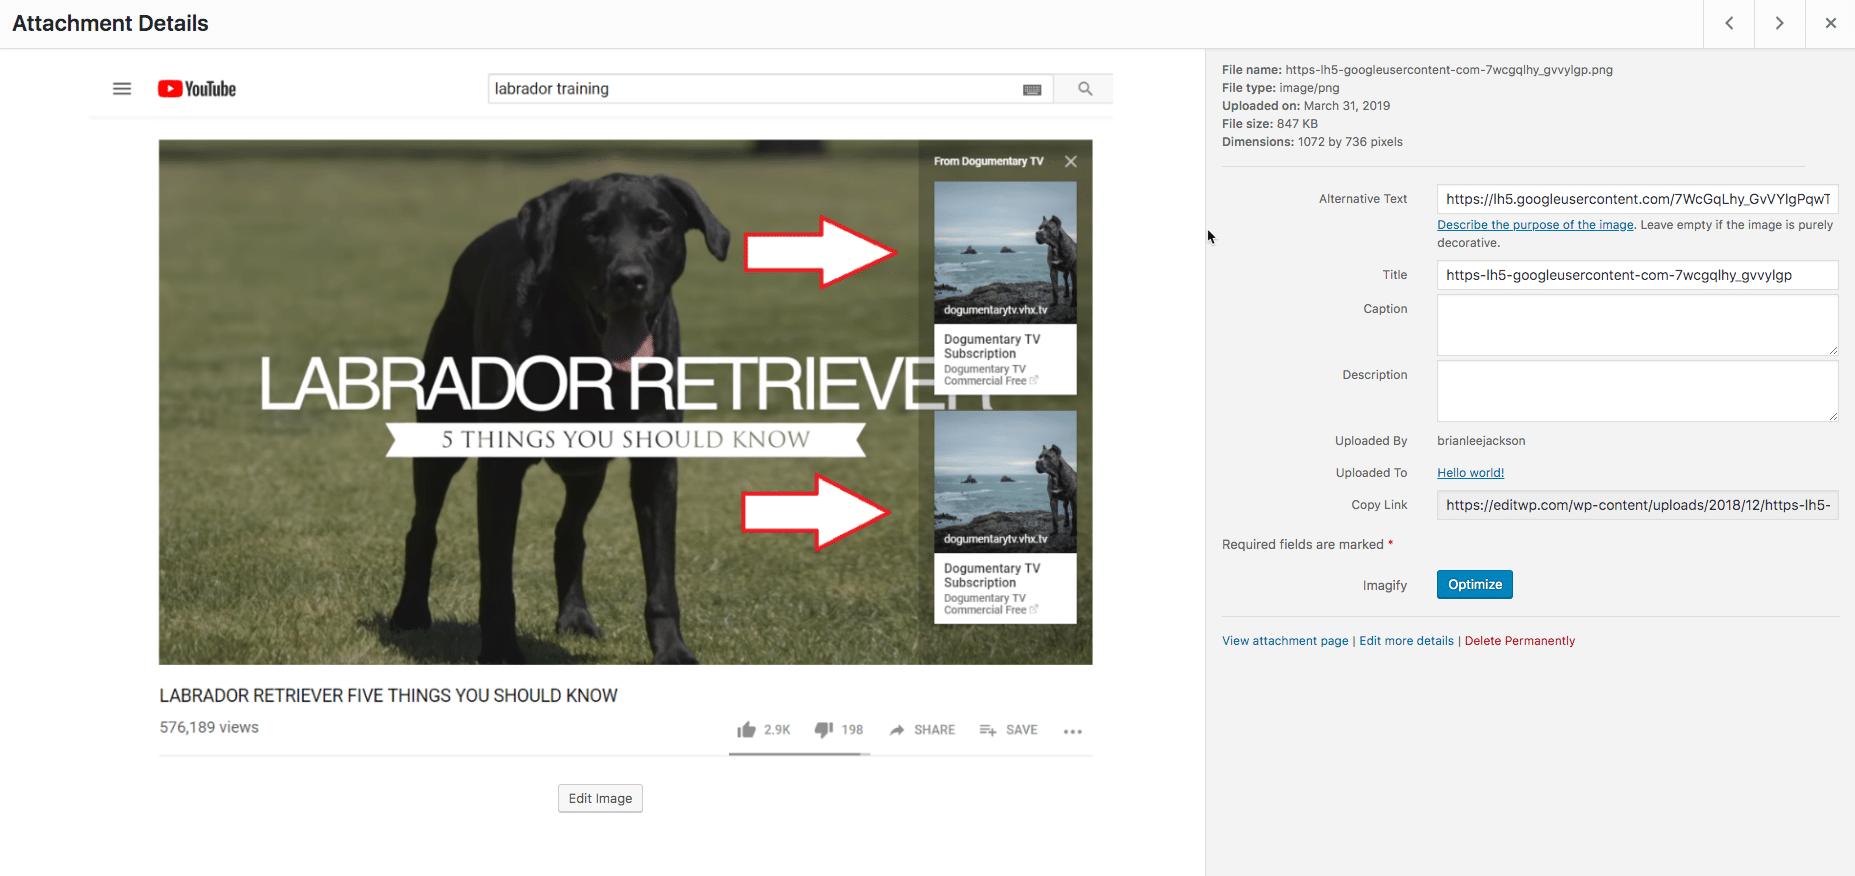 Bilage-redigeringsskärmen i WordPress